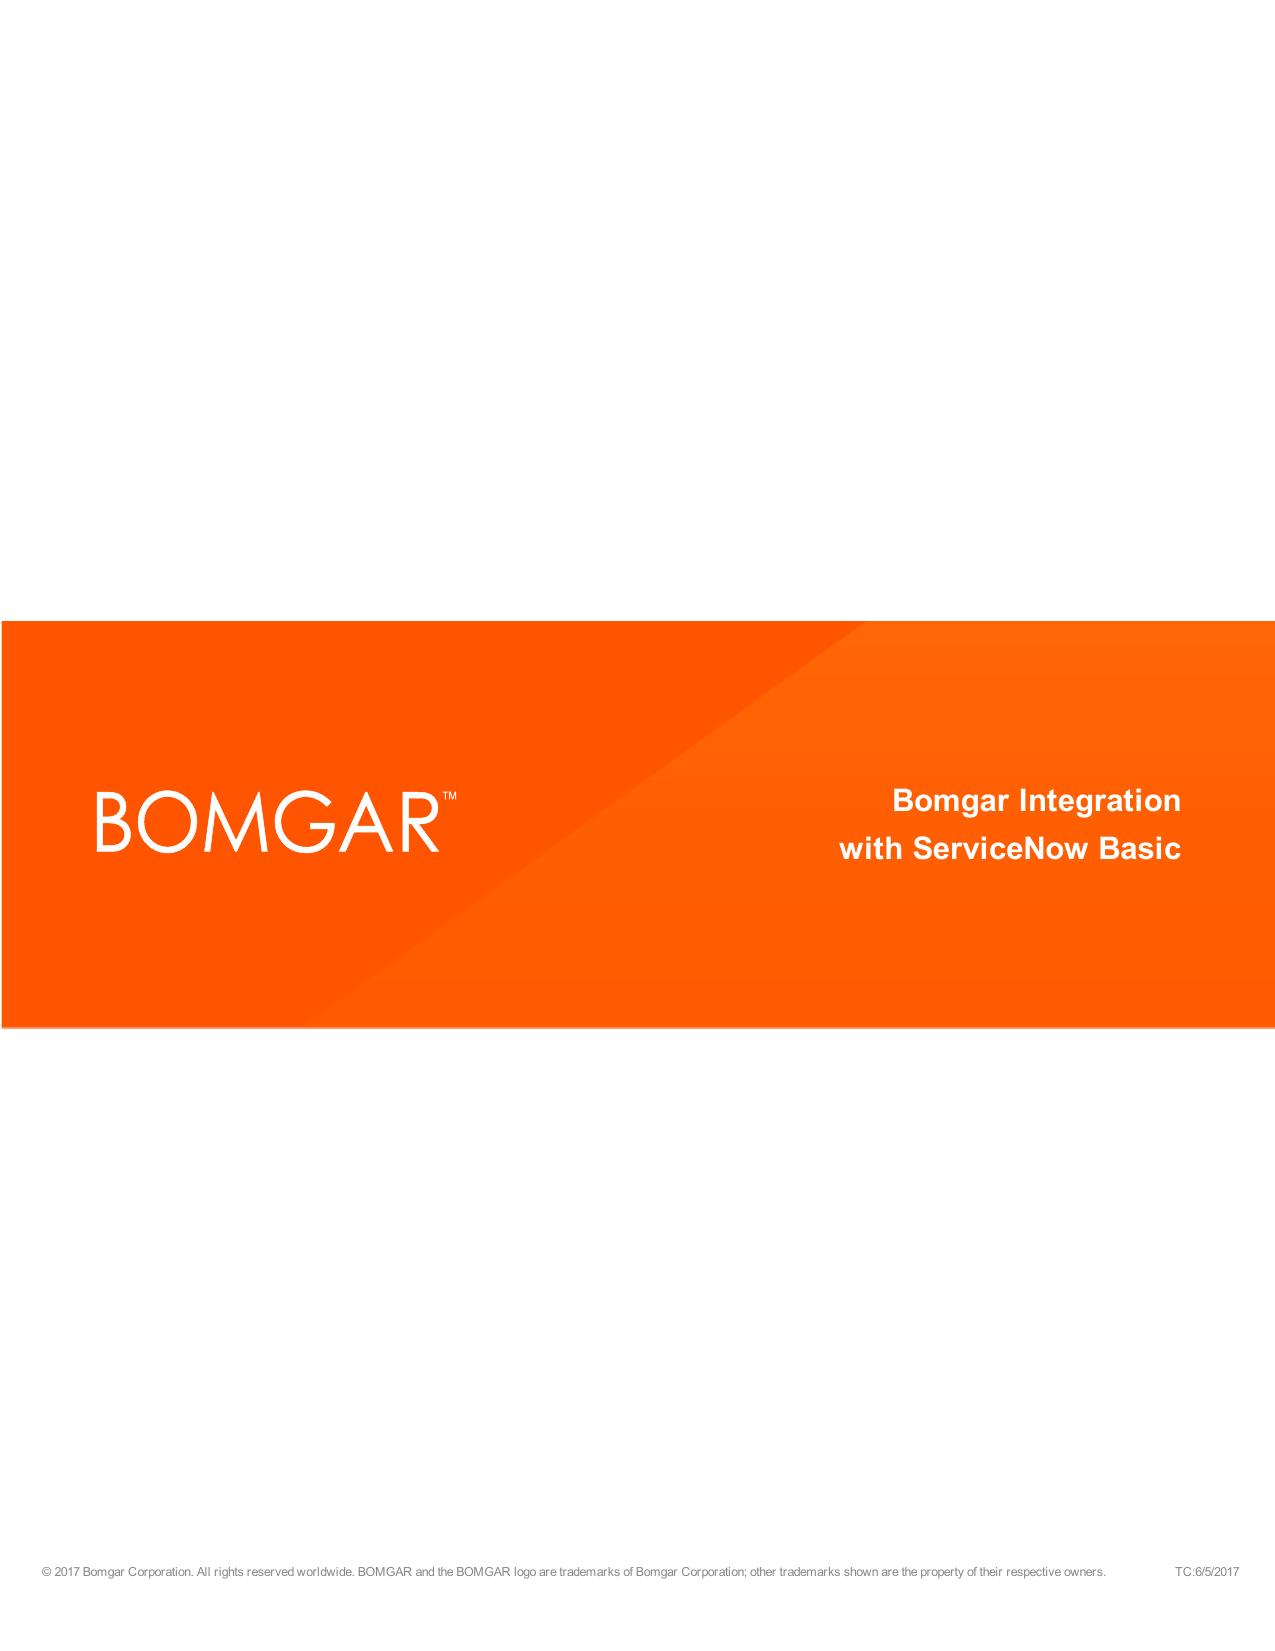 ServiceNow Basic Integration with Bomgar | manualzz com